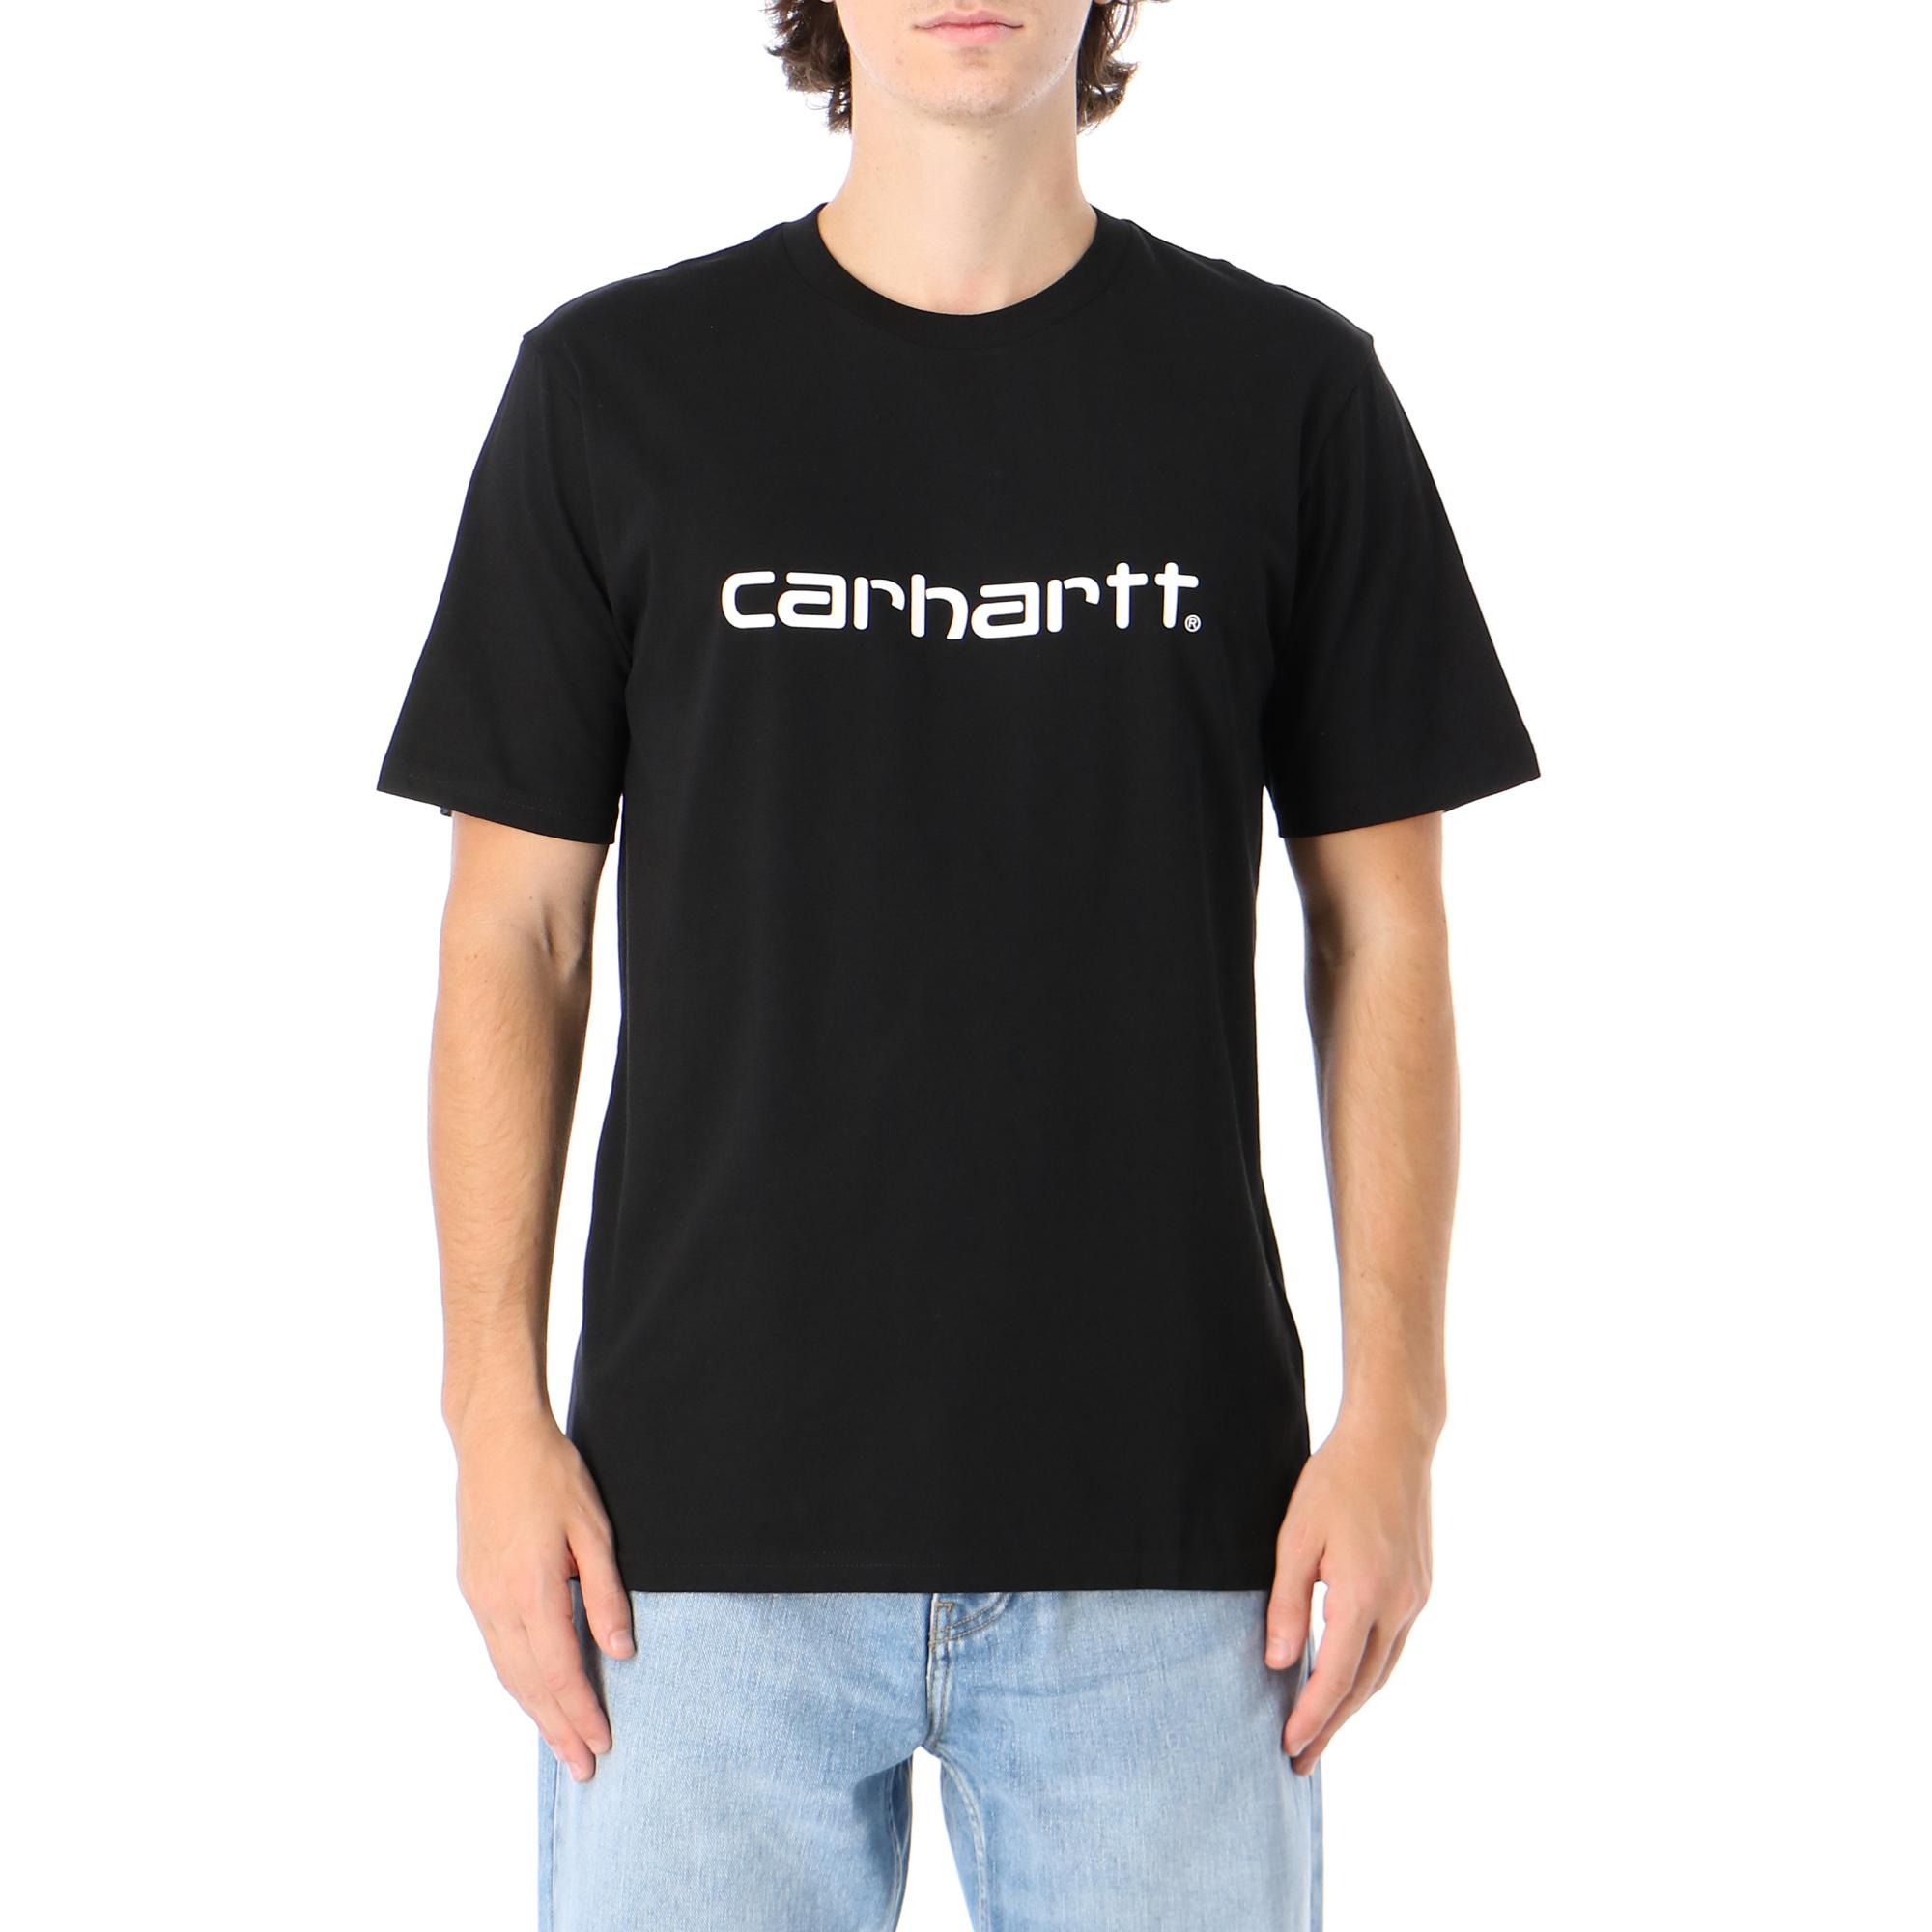 Carhartt S/s Script T-shirt Black white